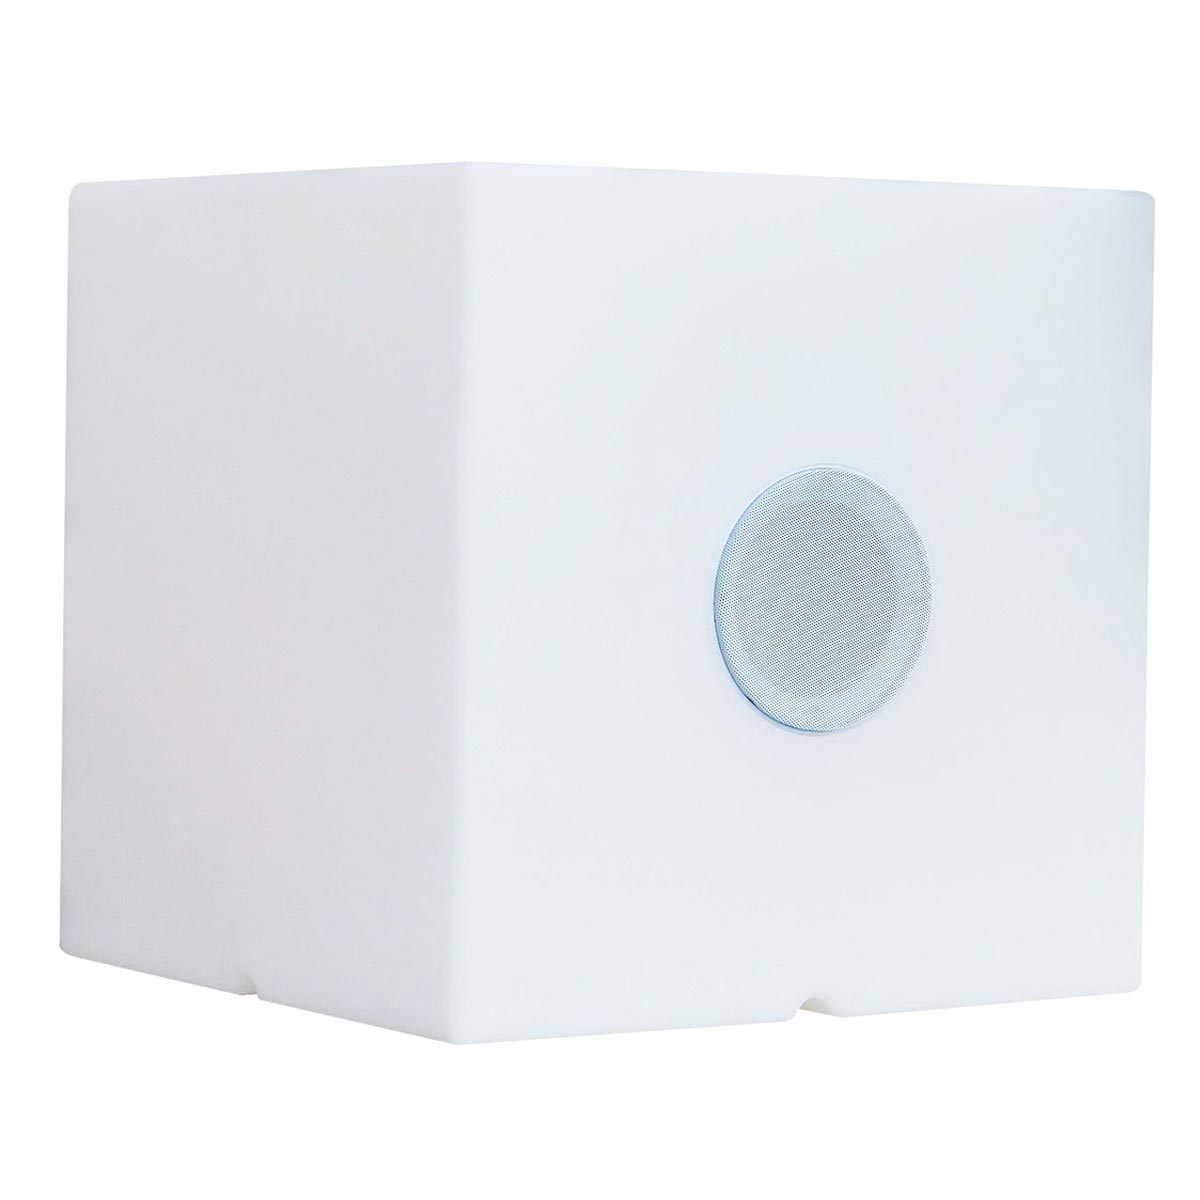 CARRY PLAY-Cube enceinte bluetooth plastique blanc H40cm